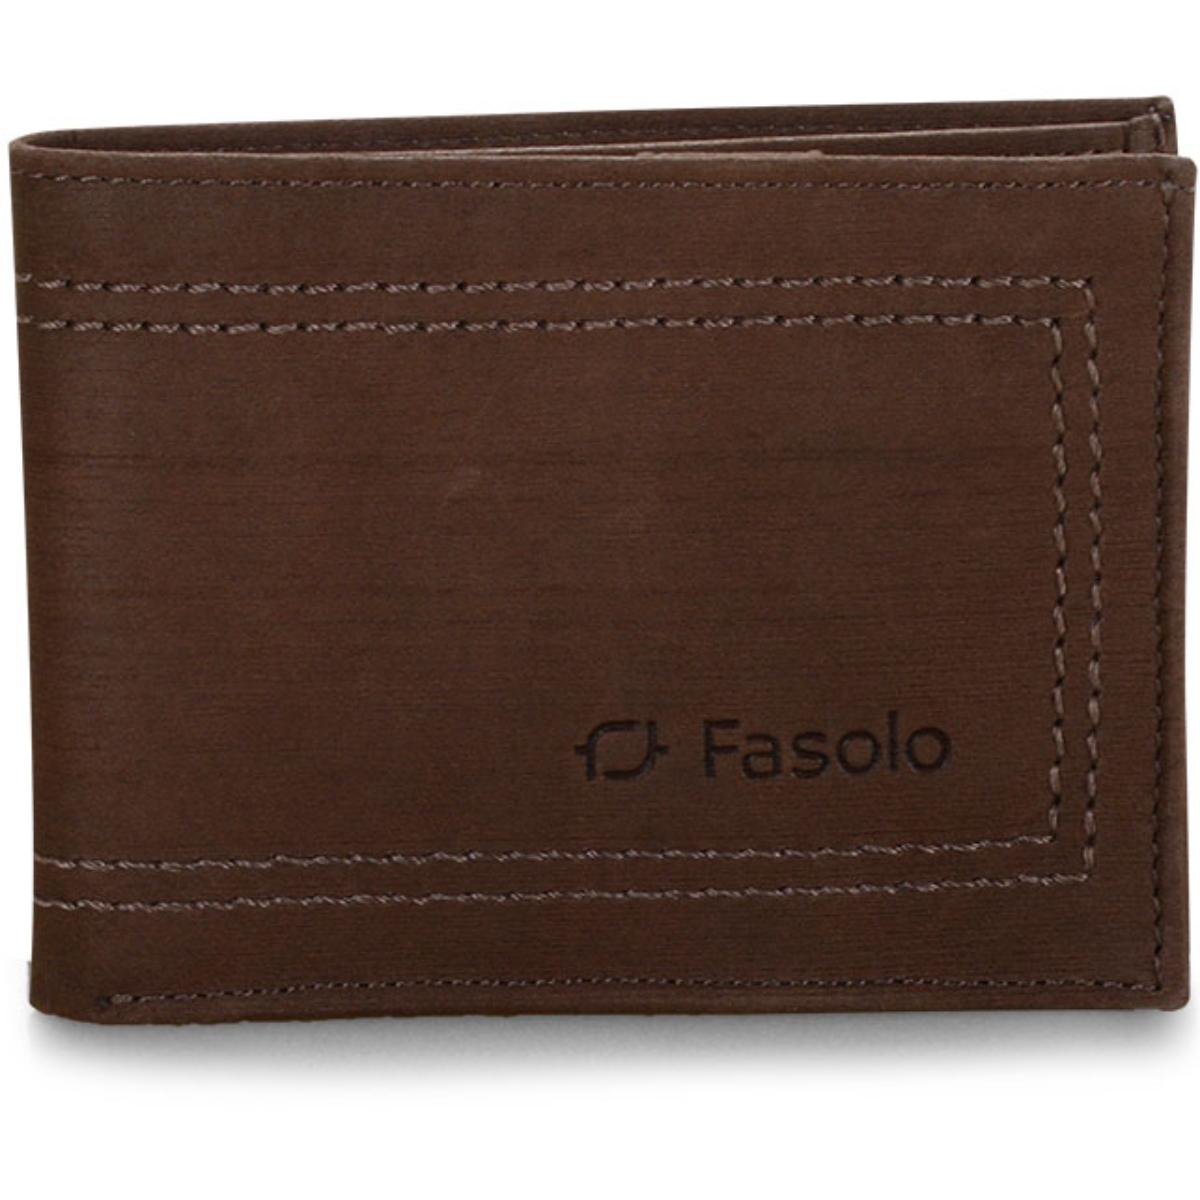 Carteira Masculina Fasolo K650067 009 Chocolate